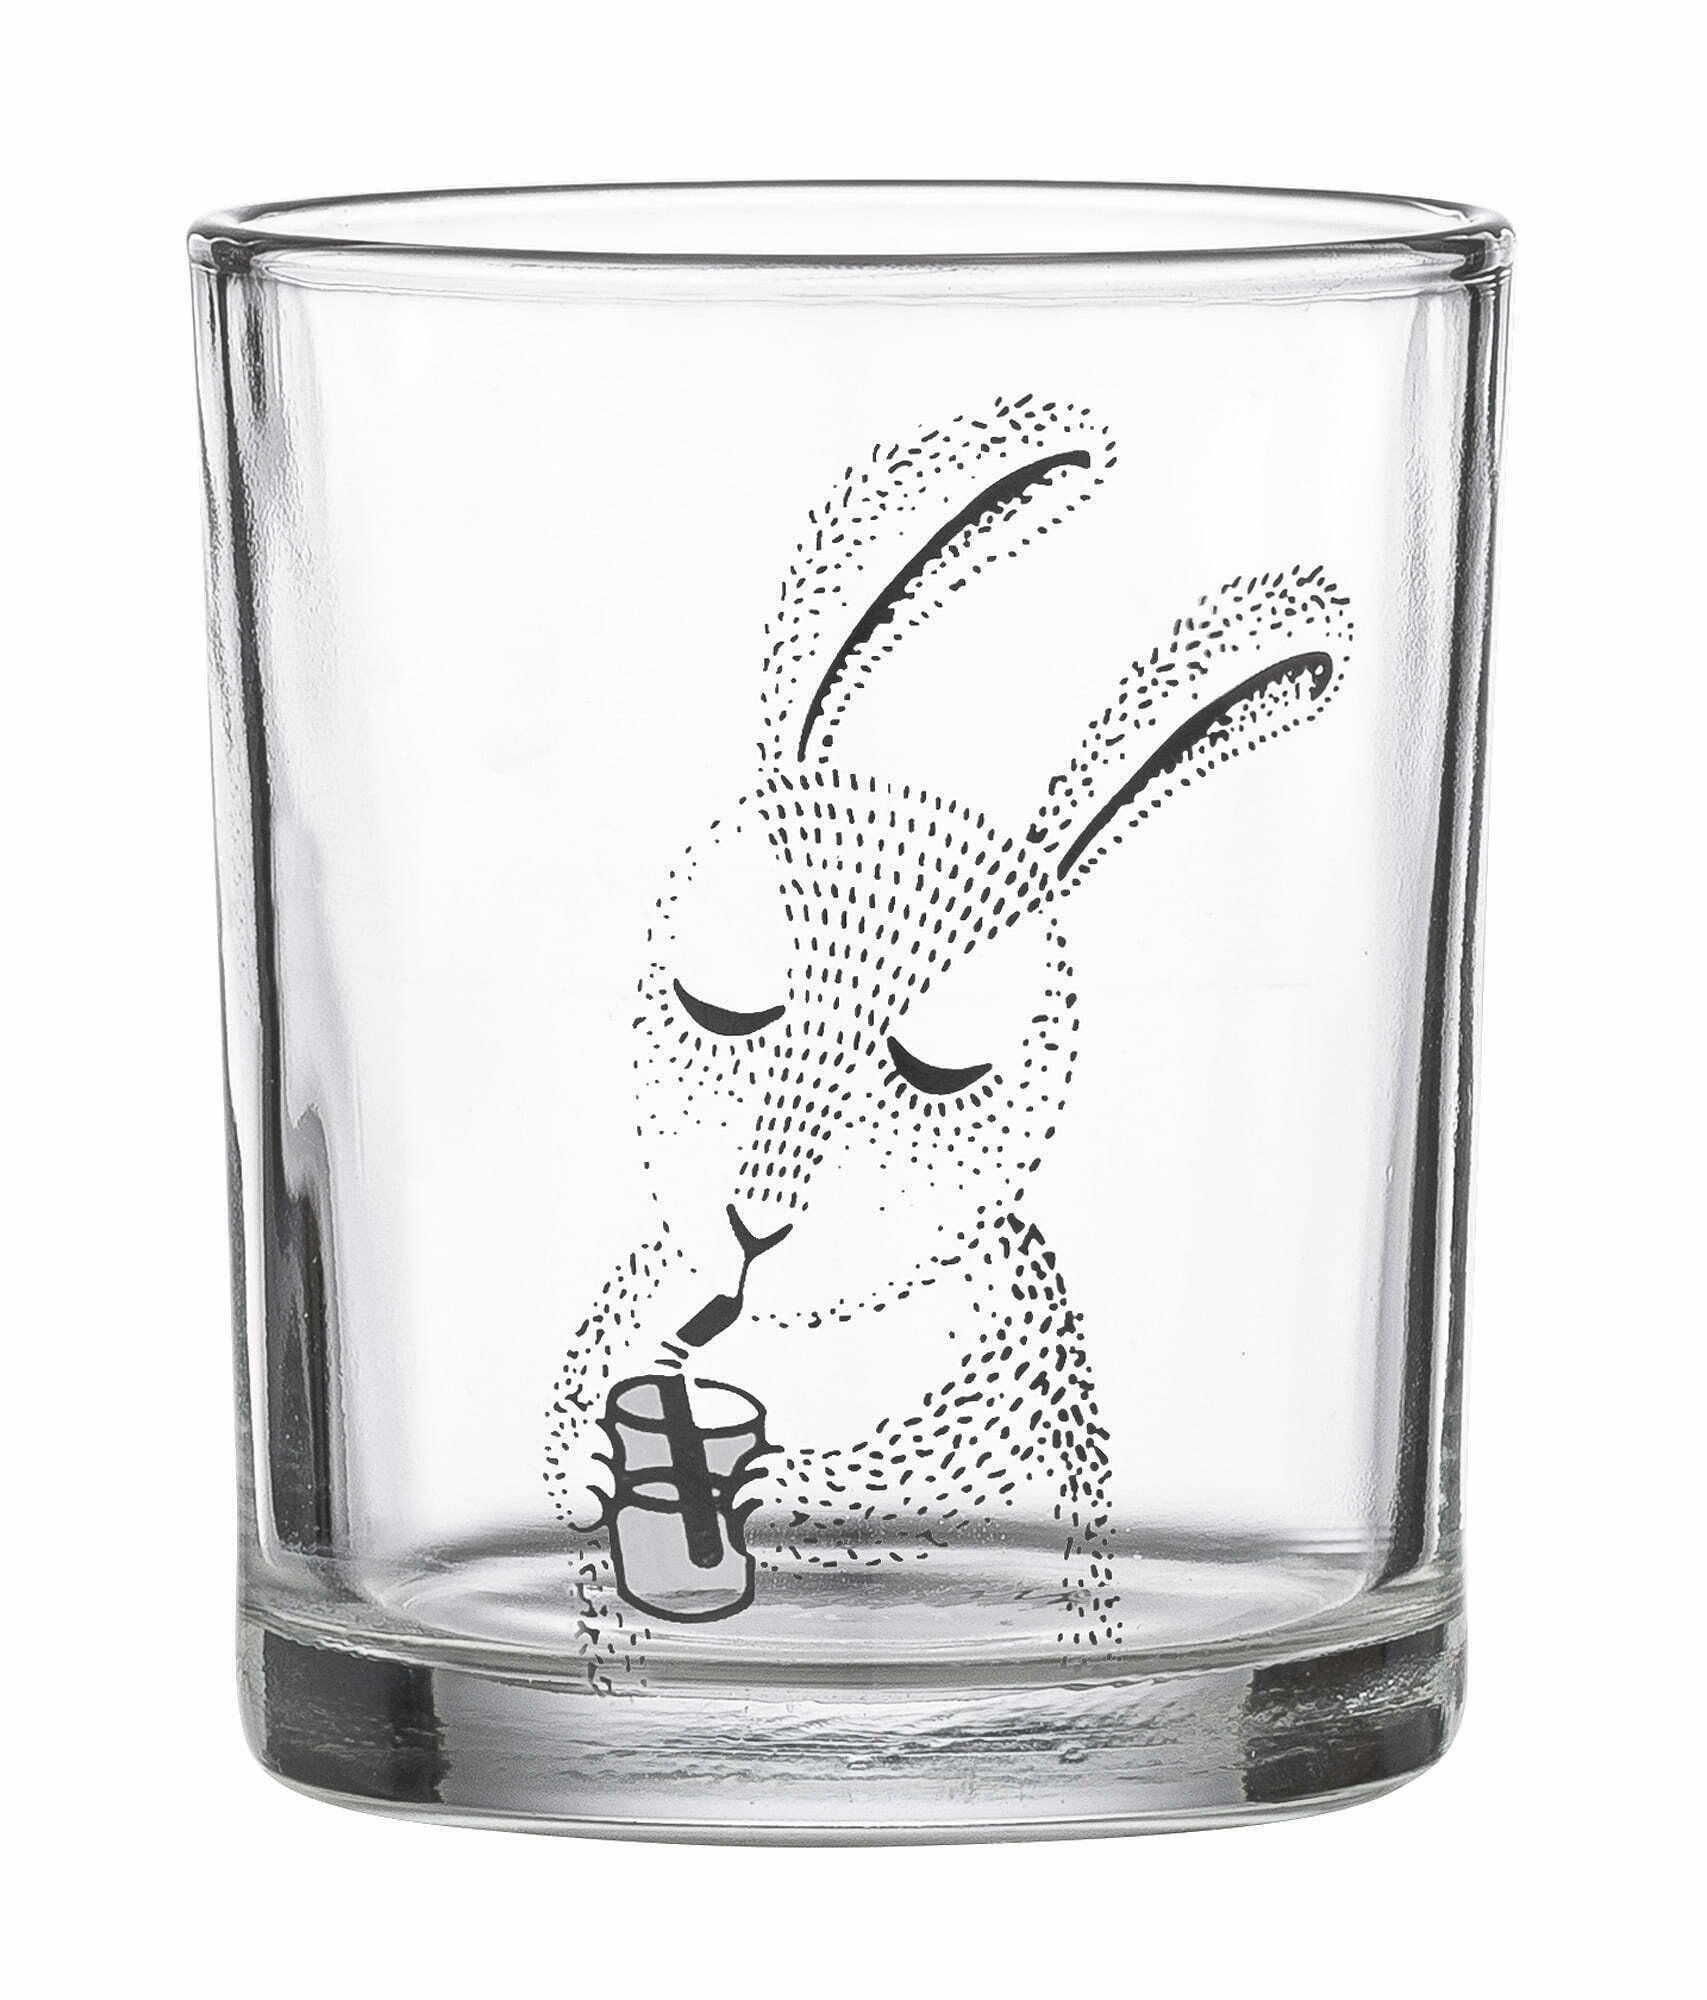 Szklanka Śpiący królik marki Bloomingville, duński dizajn